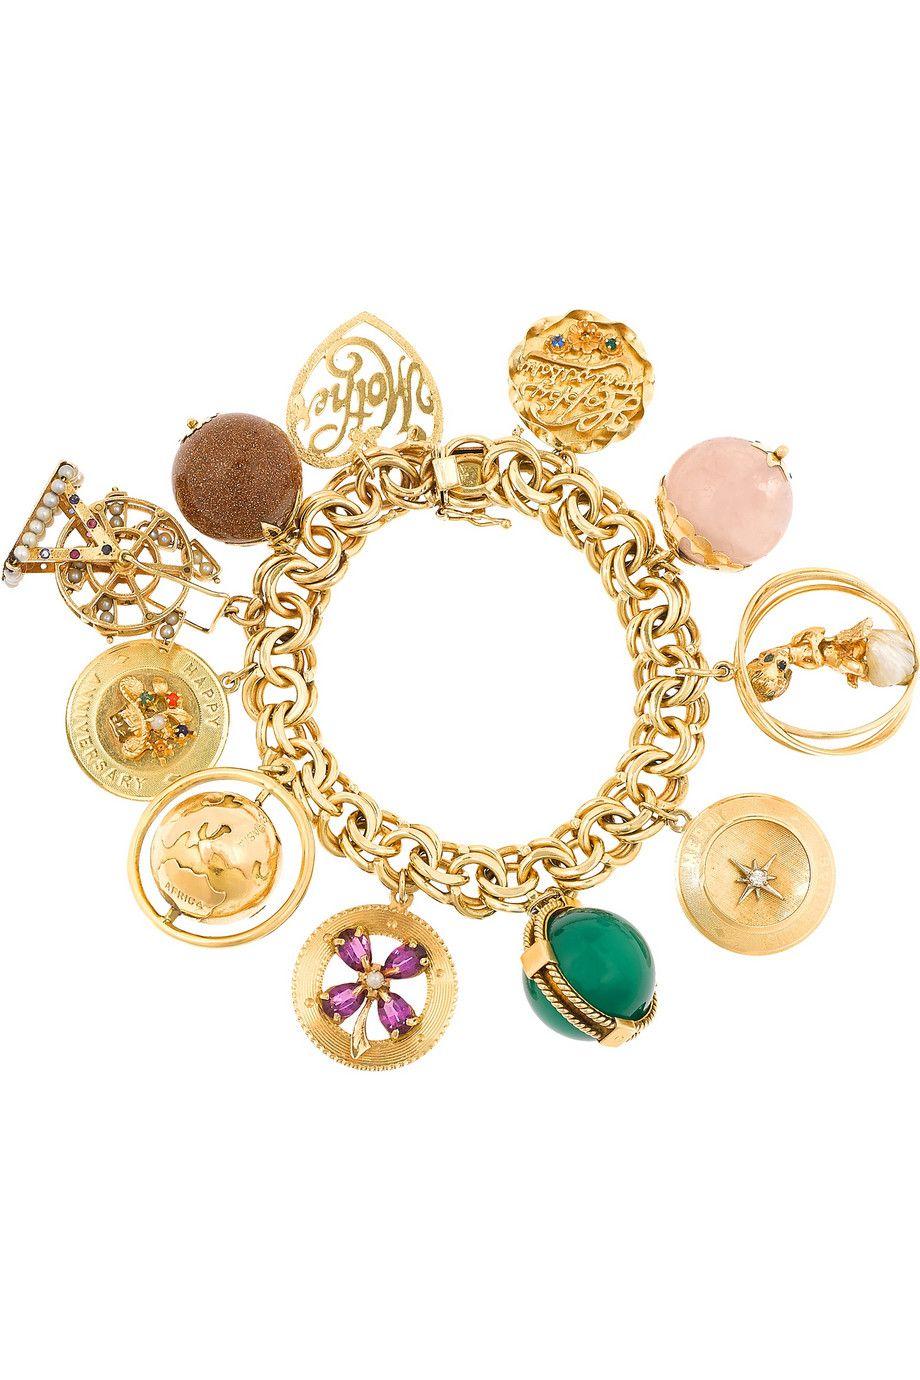 Fred Leighton  1940s 14karat Gold Multistone Charm Bracelet